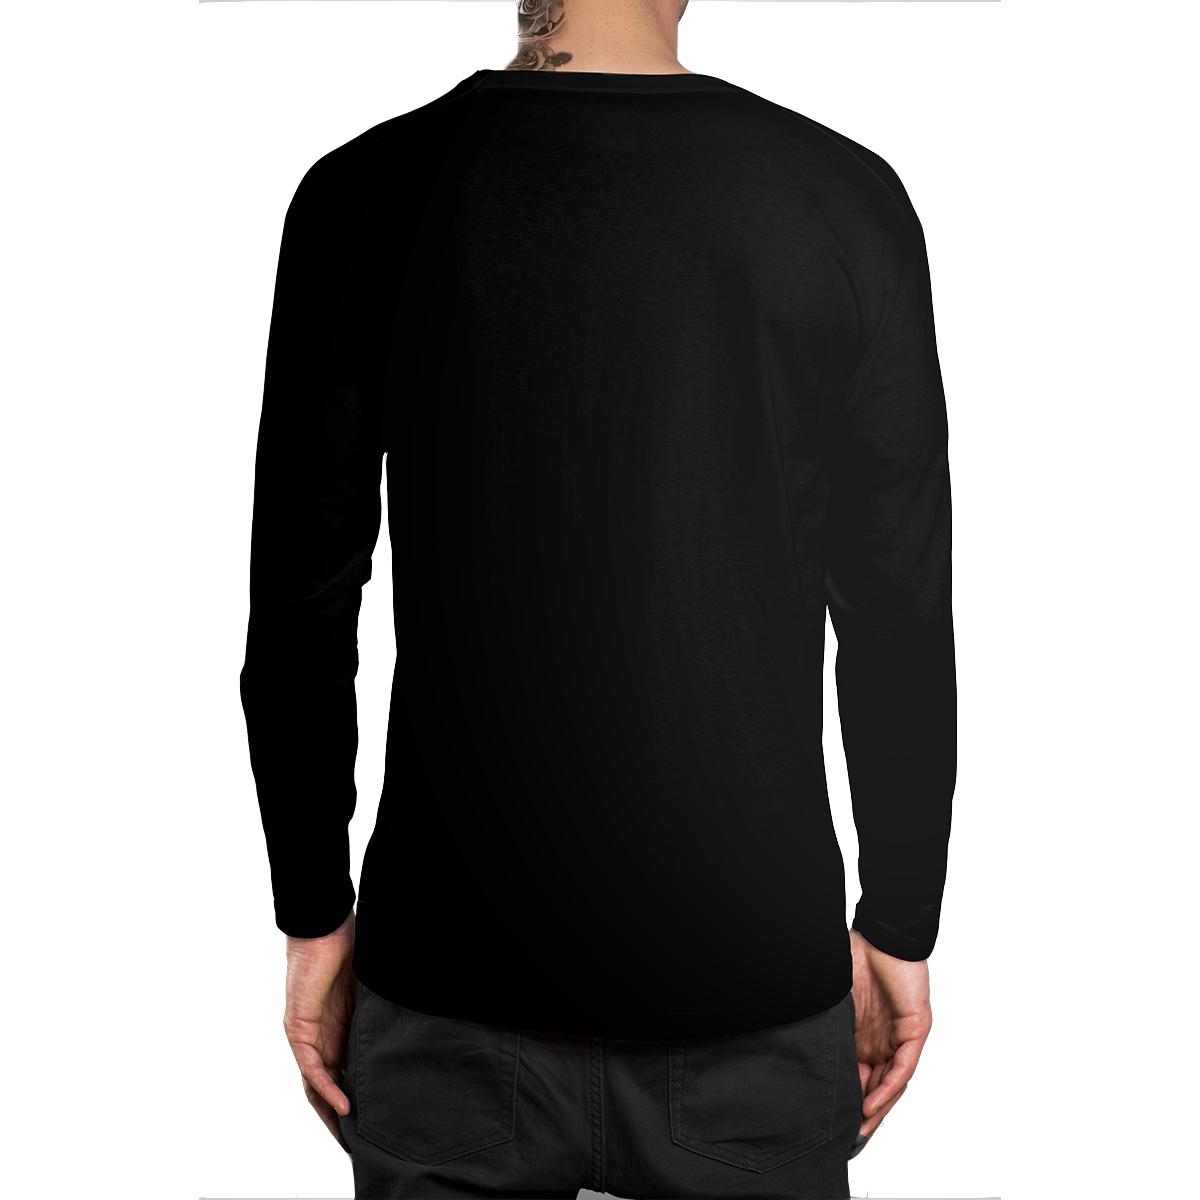 Stompy Camiseta Manga Longa Modelo 18